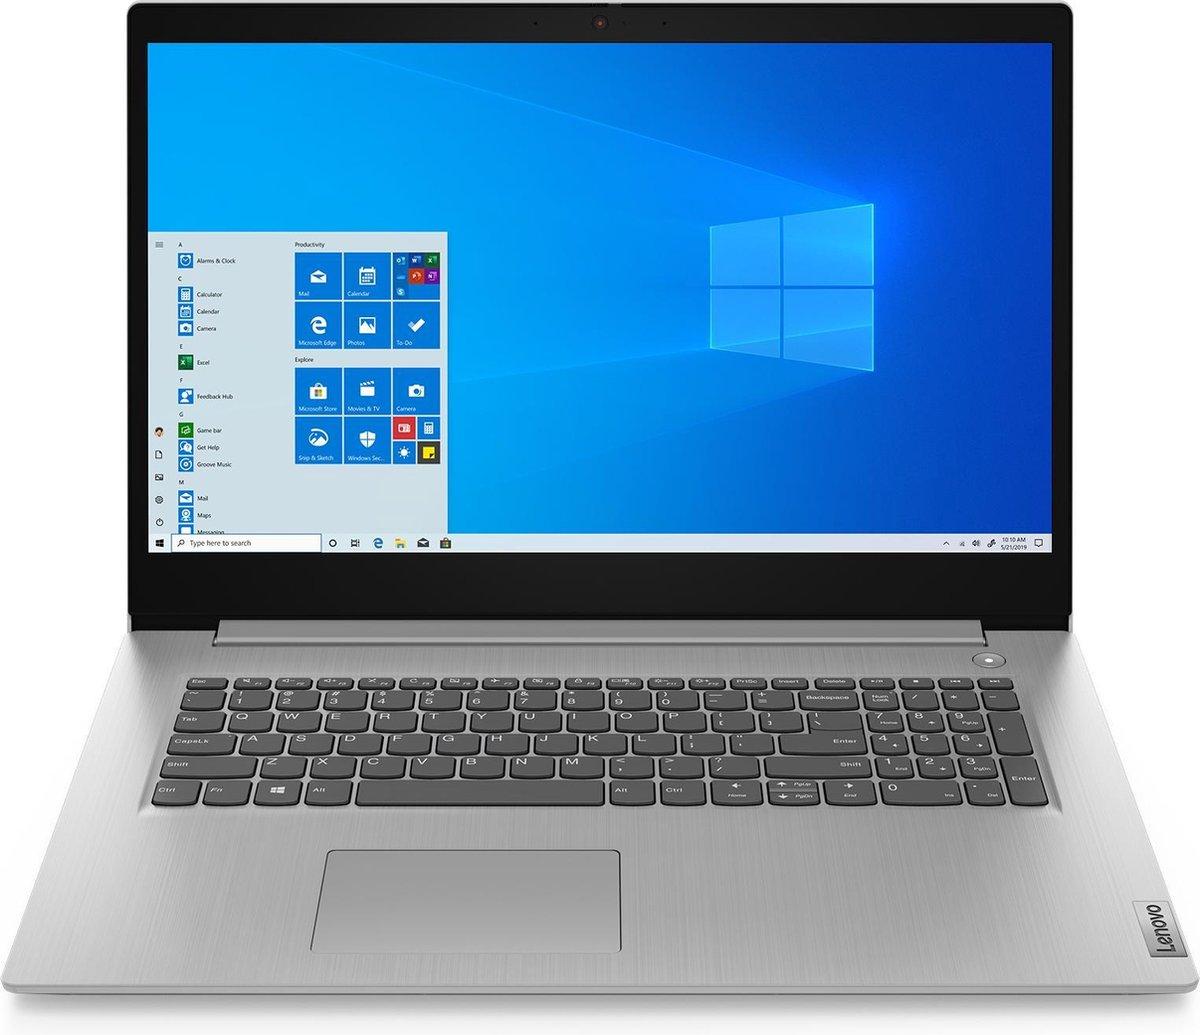 Lenovo IdeaPad 3 81W20084MH - Laptop - 17.3 Inch